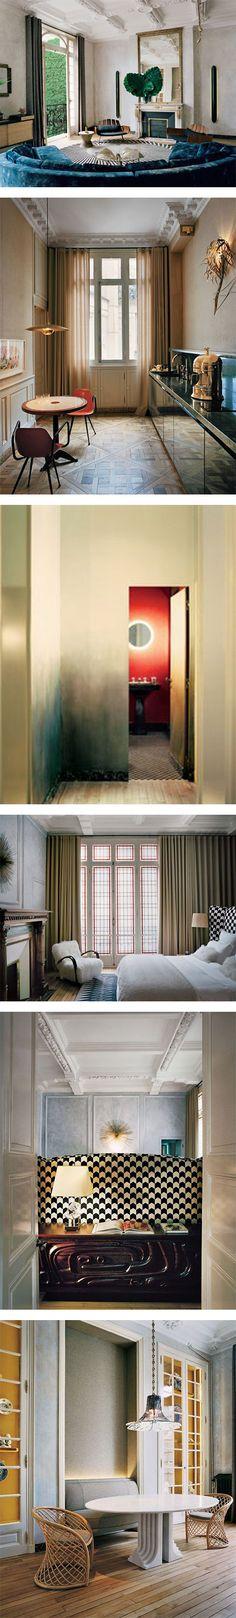 A beautiful apartment by KO Studio in Paris on Nuji.com #homedecor #interiordesign #kostudio